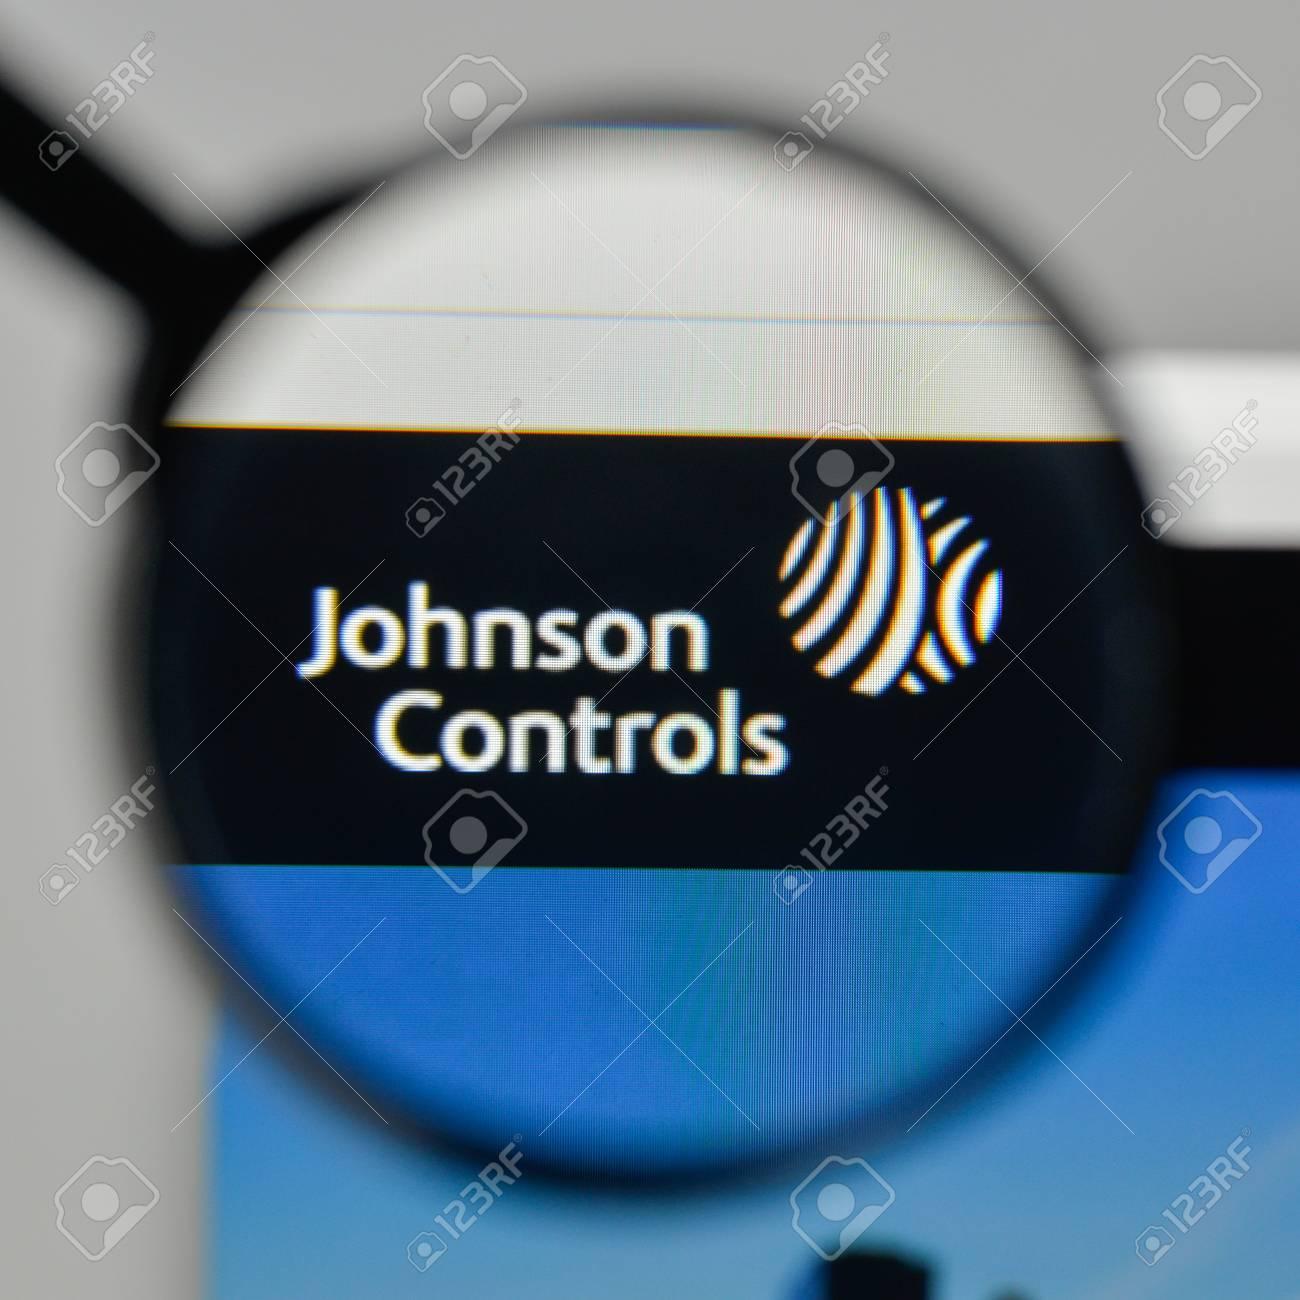 Milan, Italy - November 1, 2017: Johnson Controls logo on the